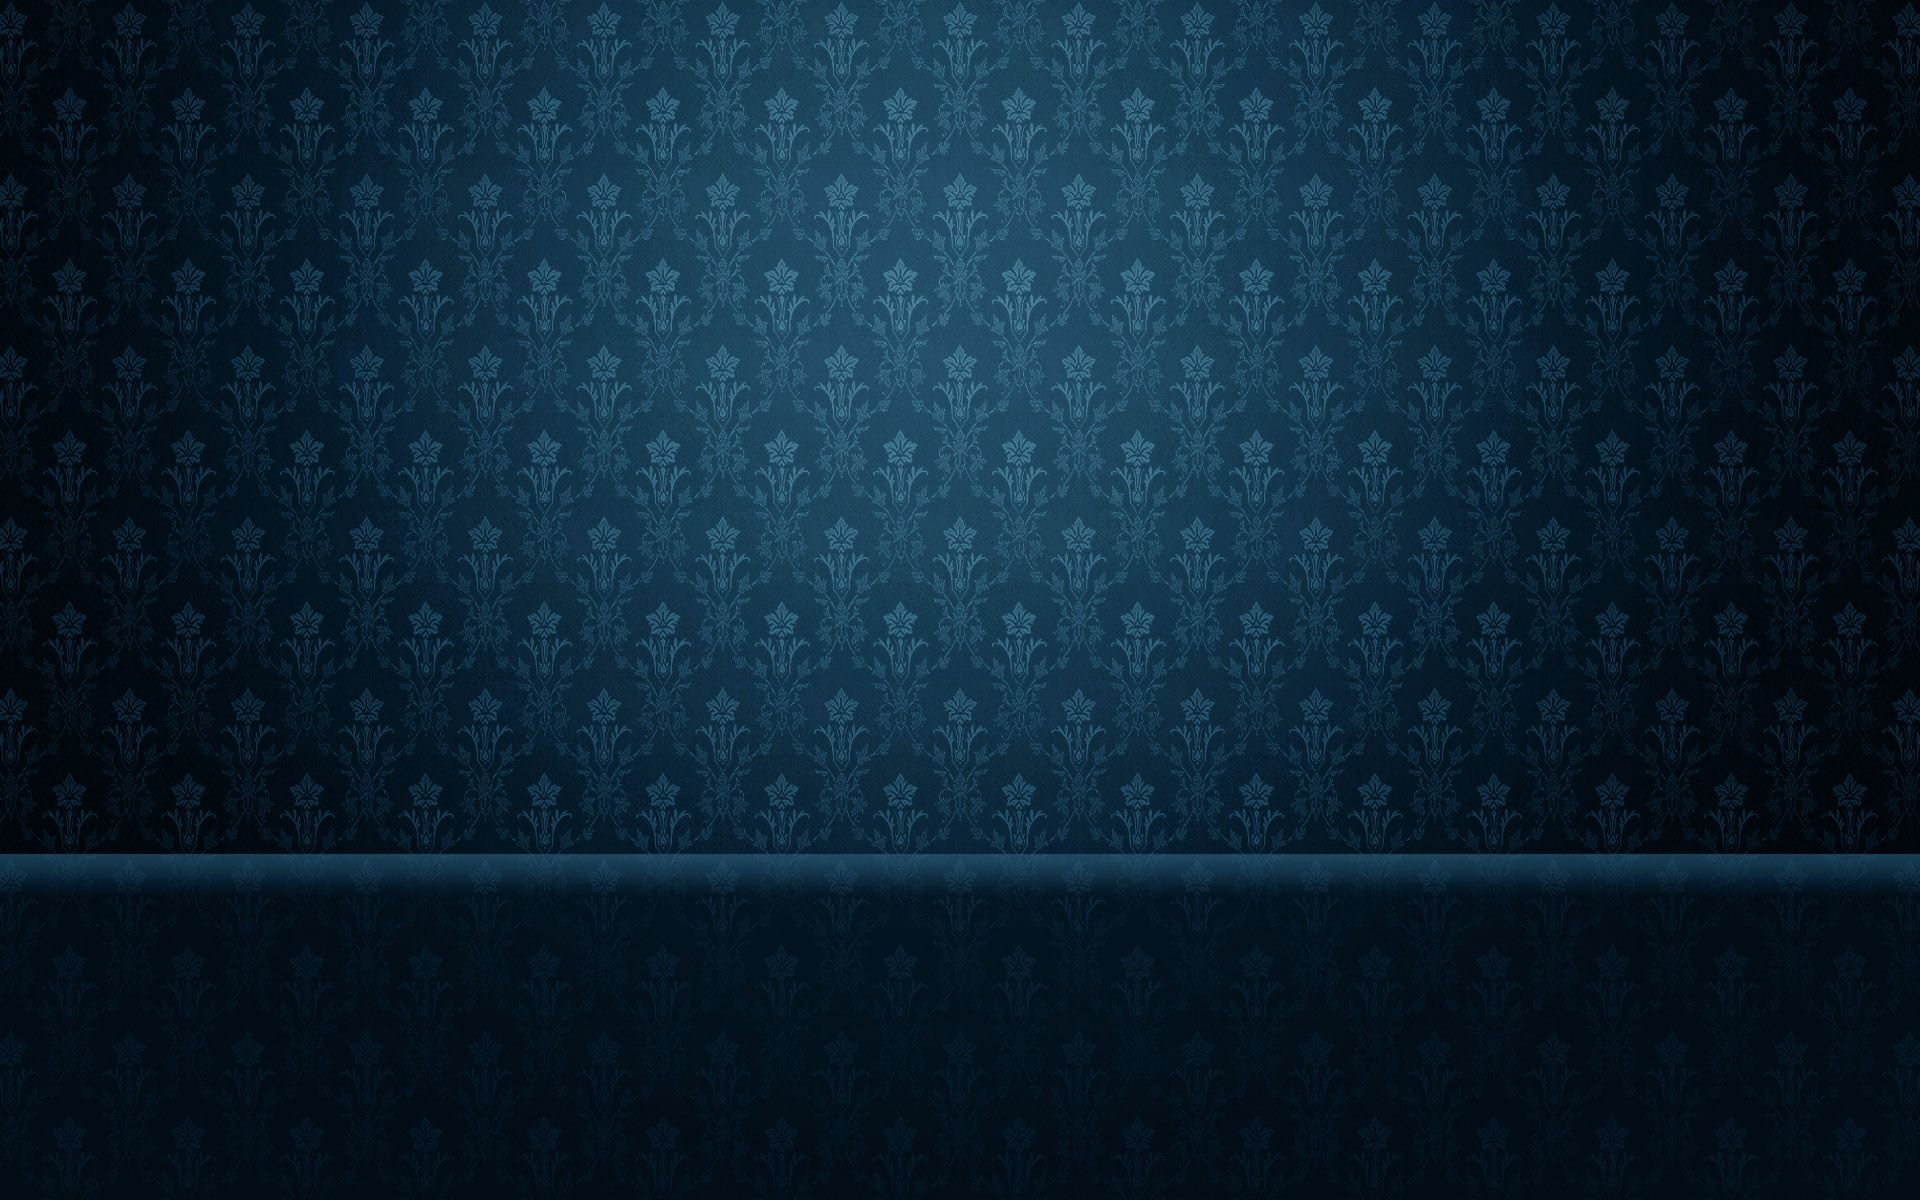 floral wallpapers wallpaper model albastru blue pattern 1920x1200